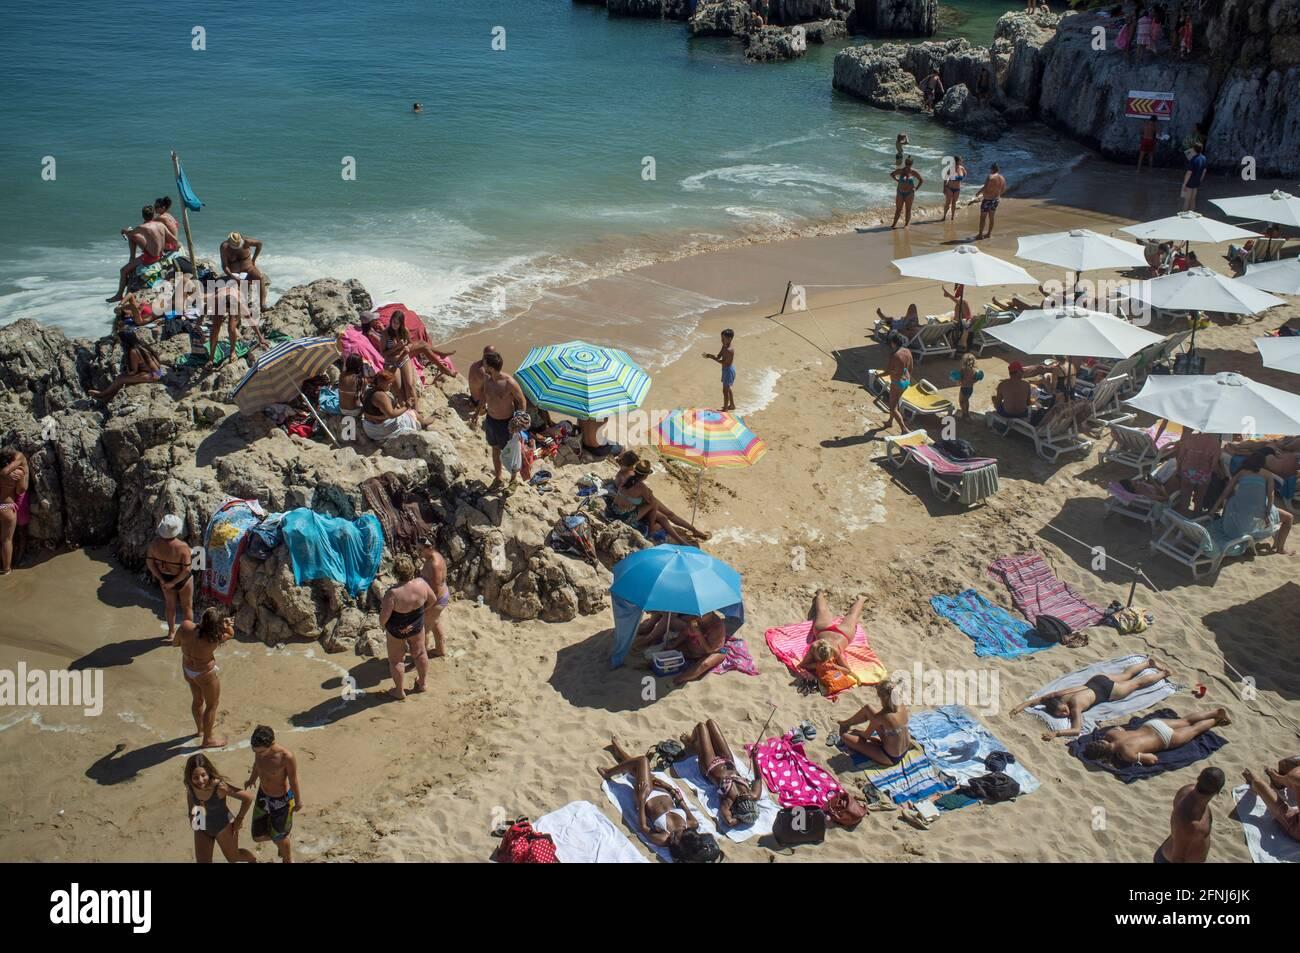 Praia da Rainha, Cascais, b. Lissabon, Portugal Stock Photo